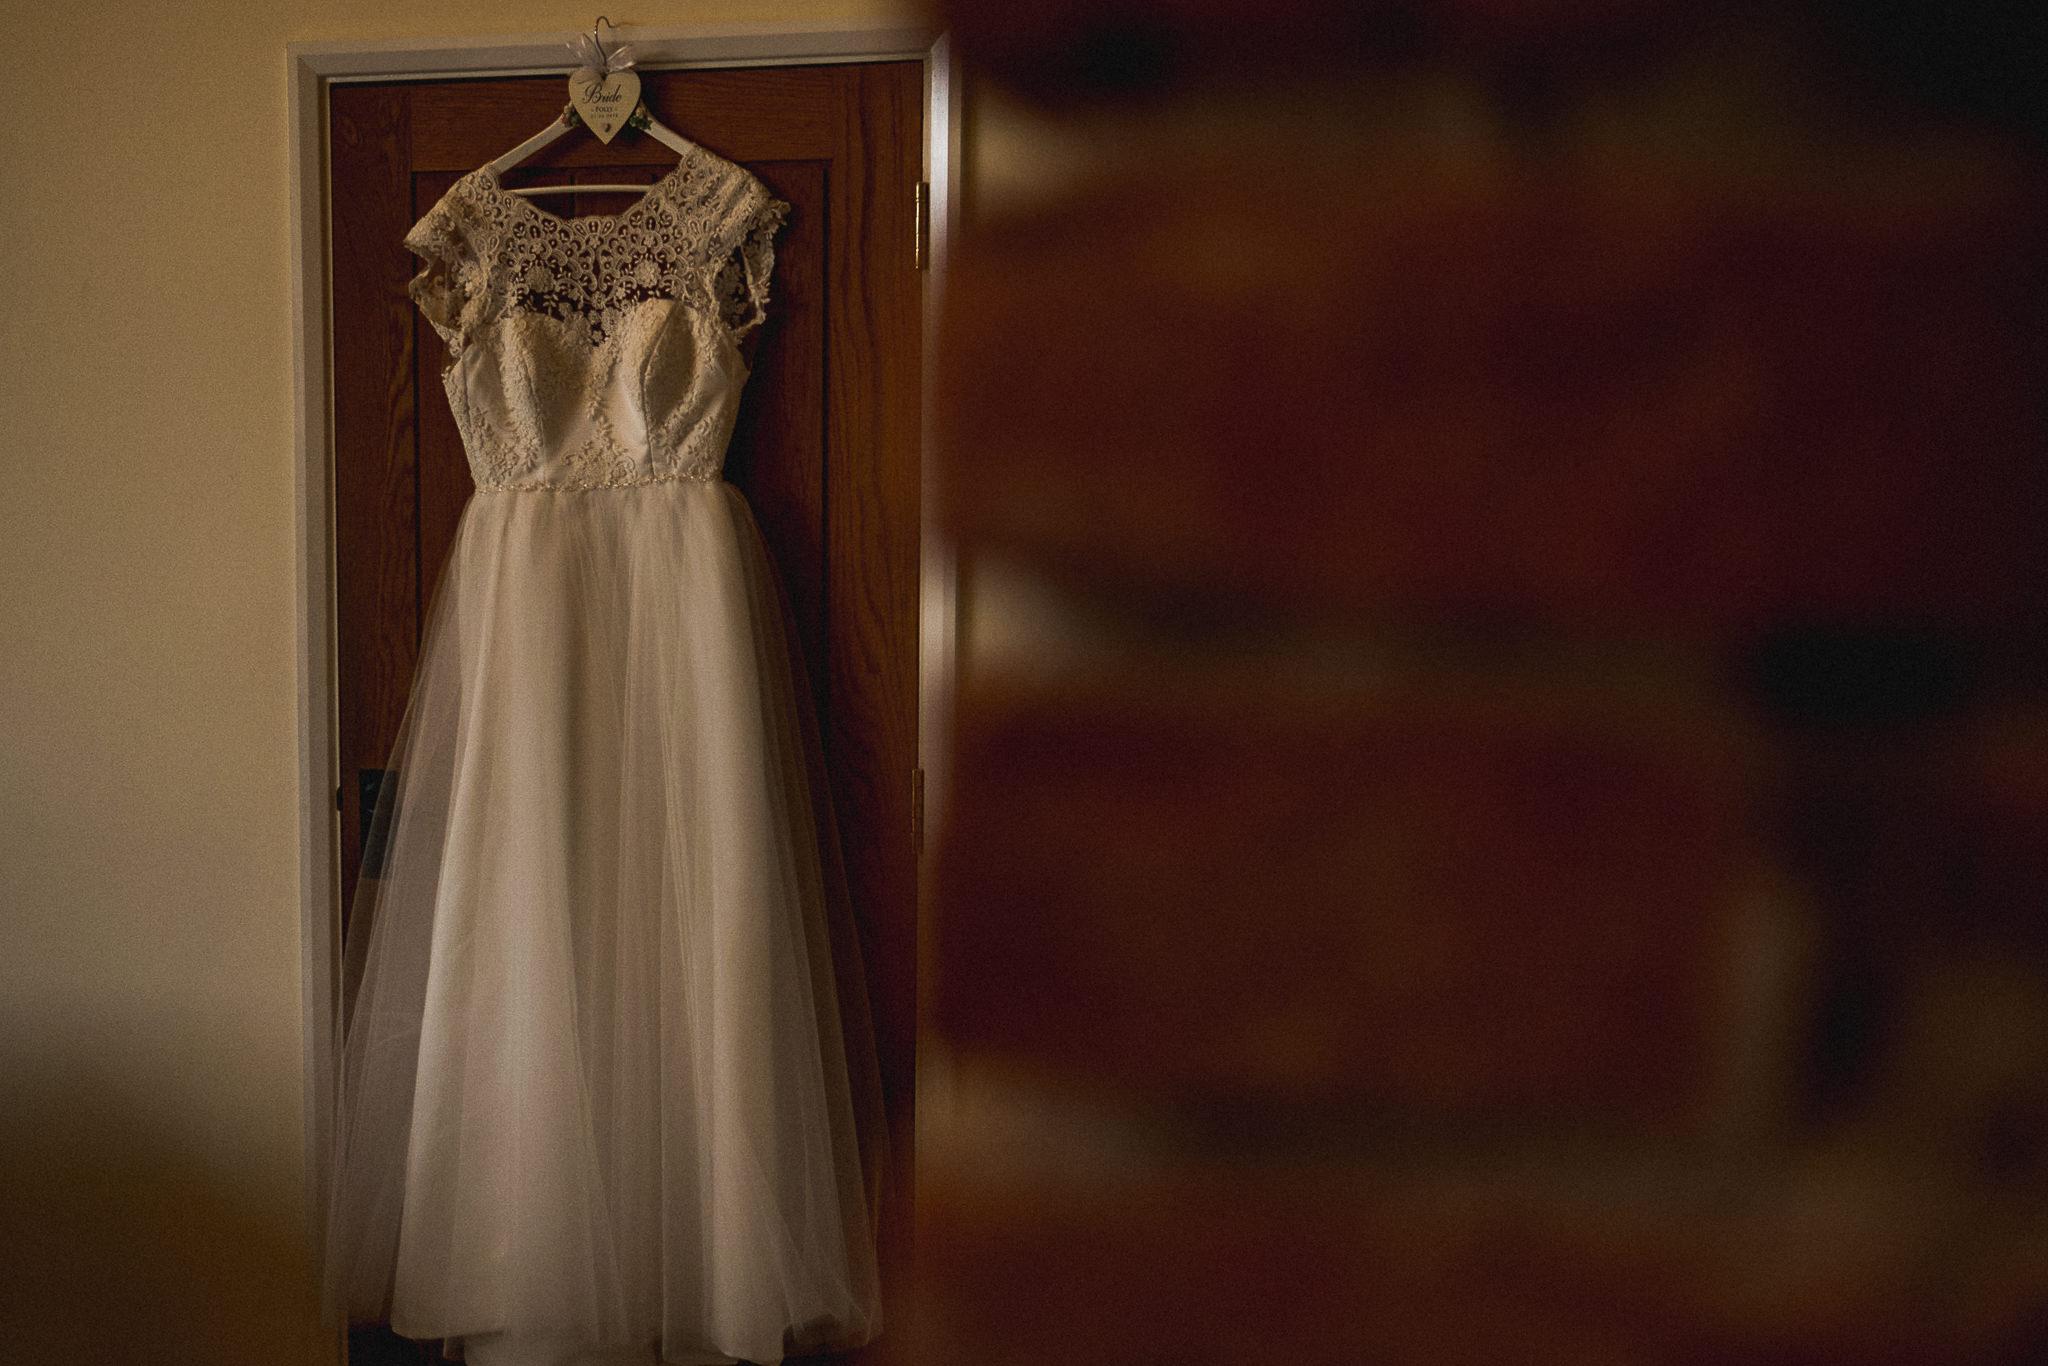 Bridal gown hanging on barn doorway